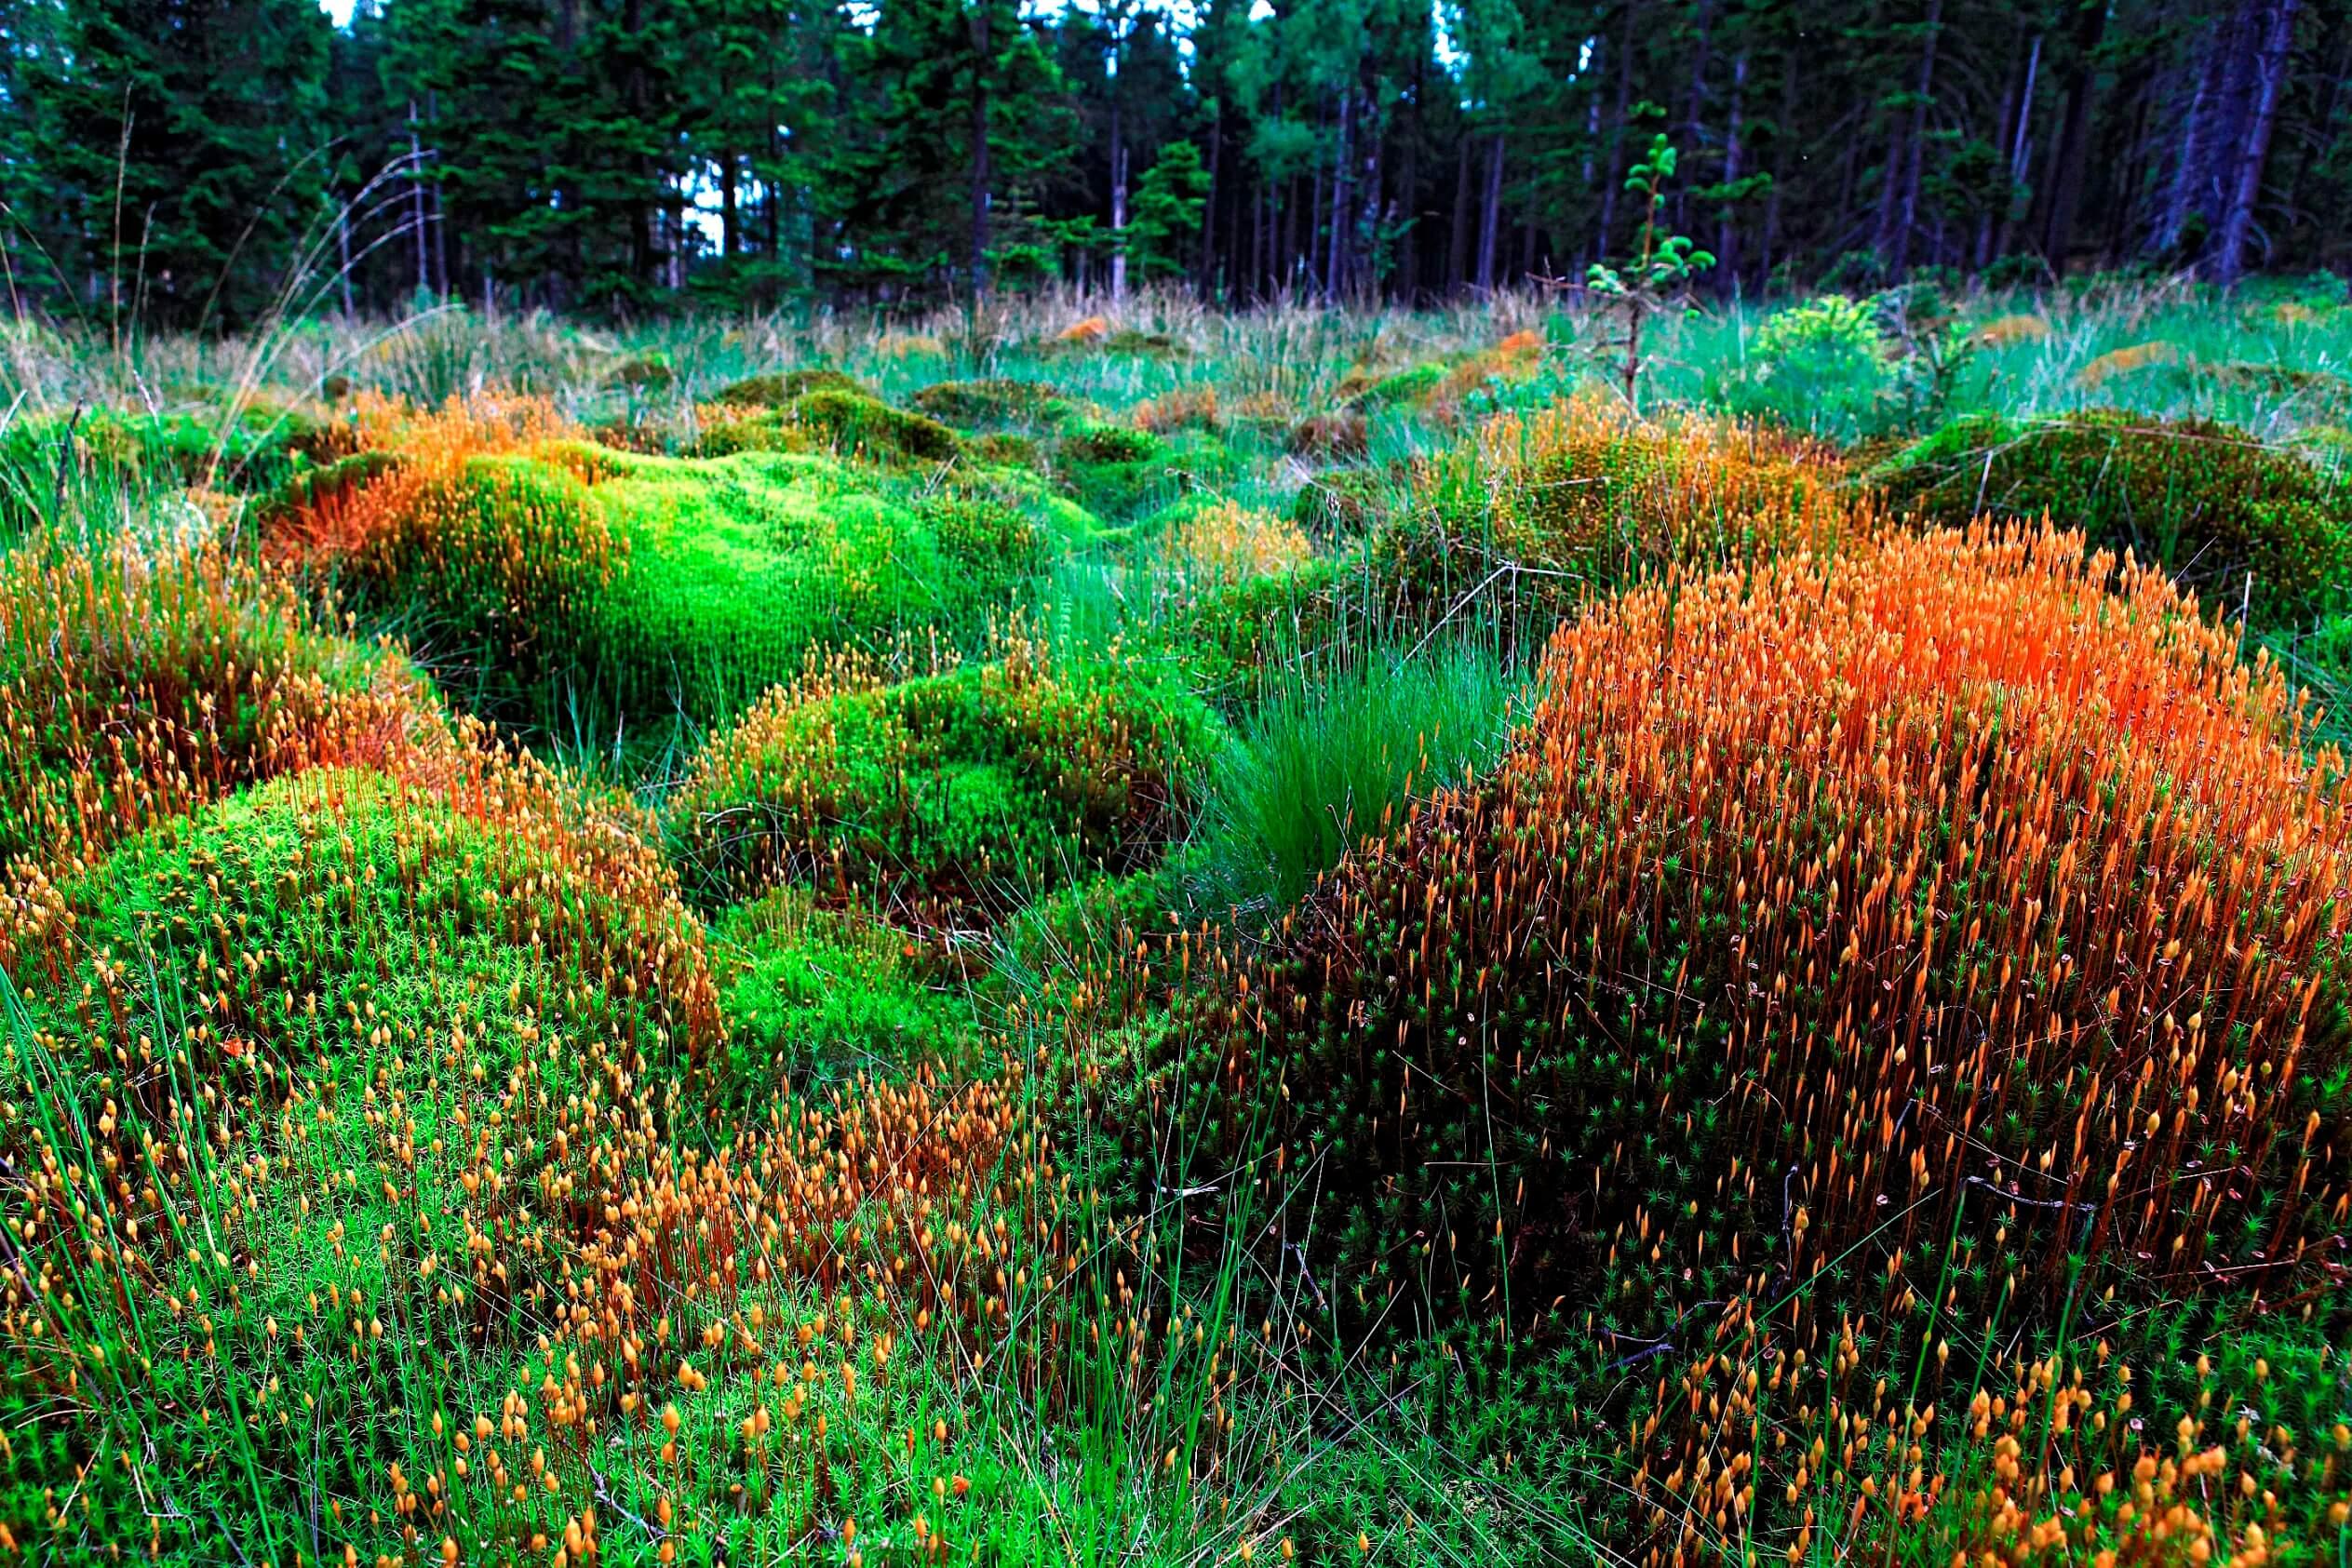 Nationalpark Hunsrück Hochwald - Frauenhaarmoos im Moor